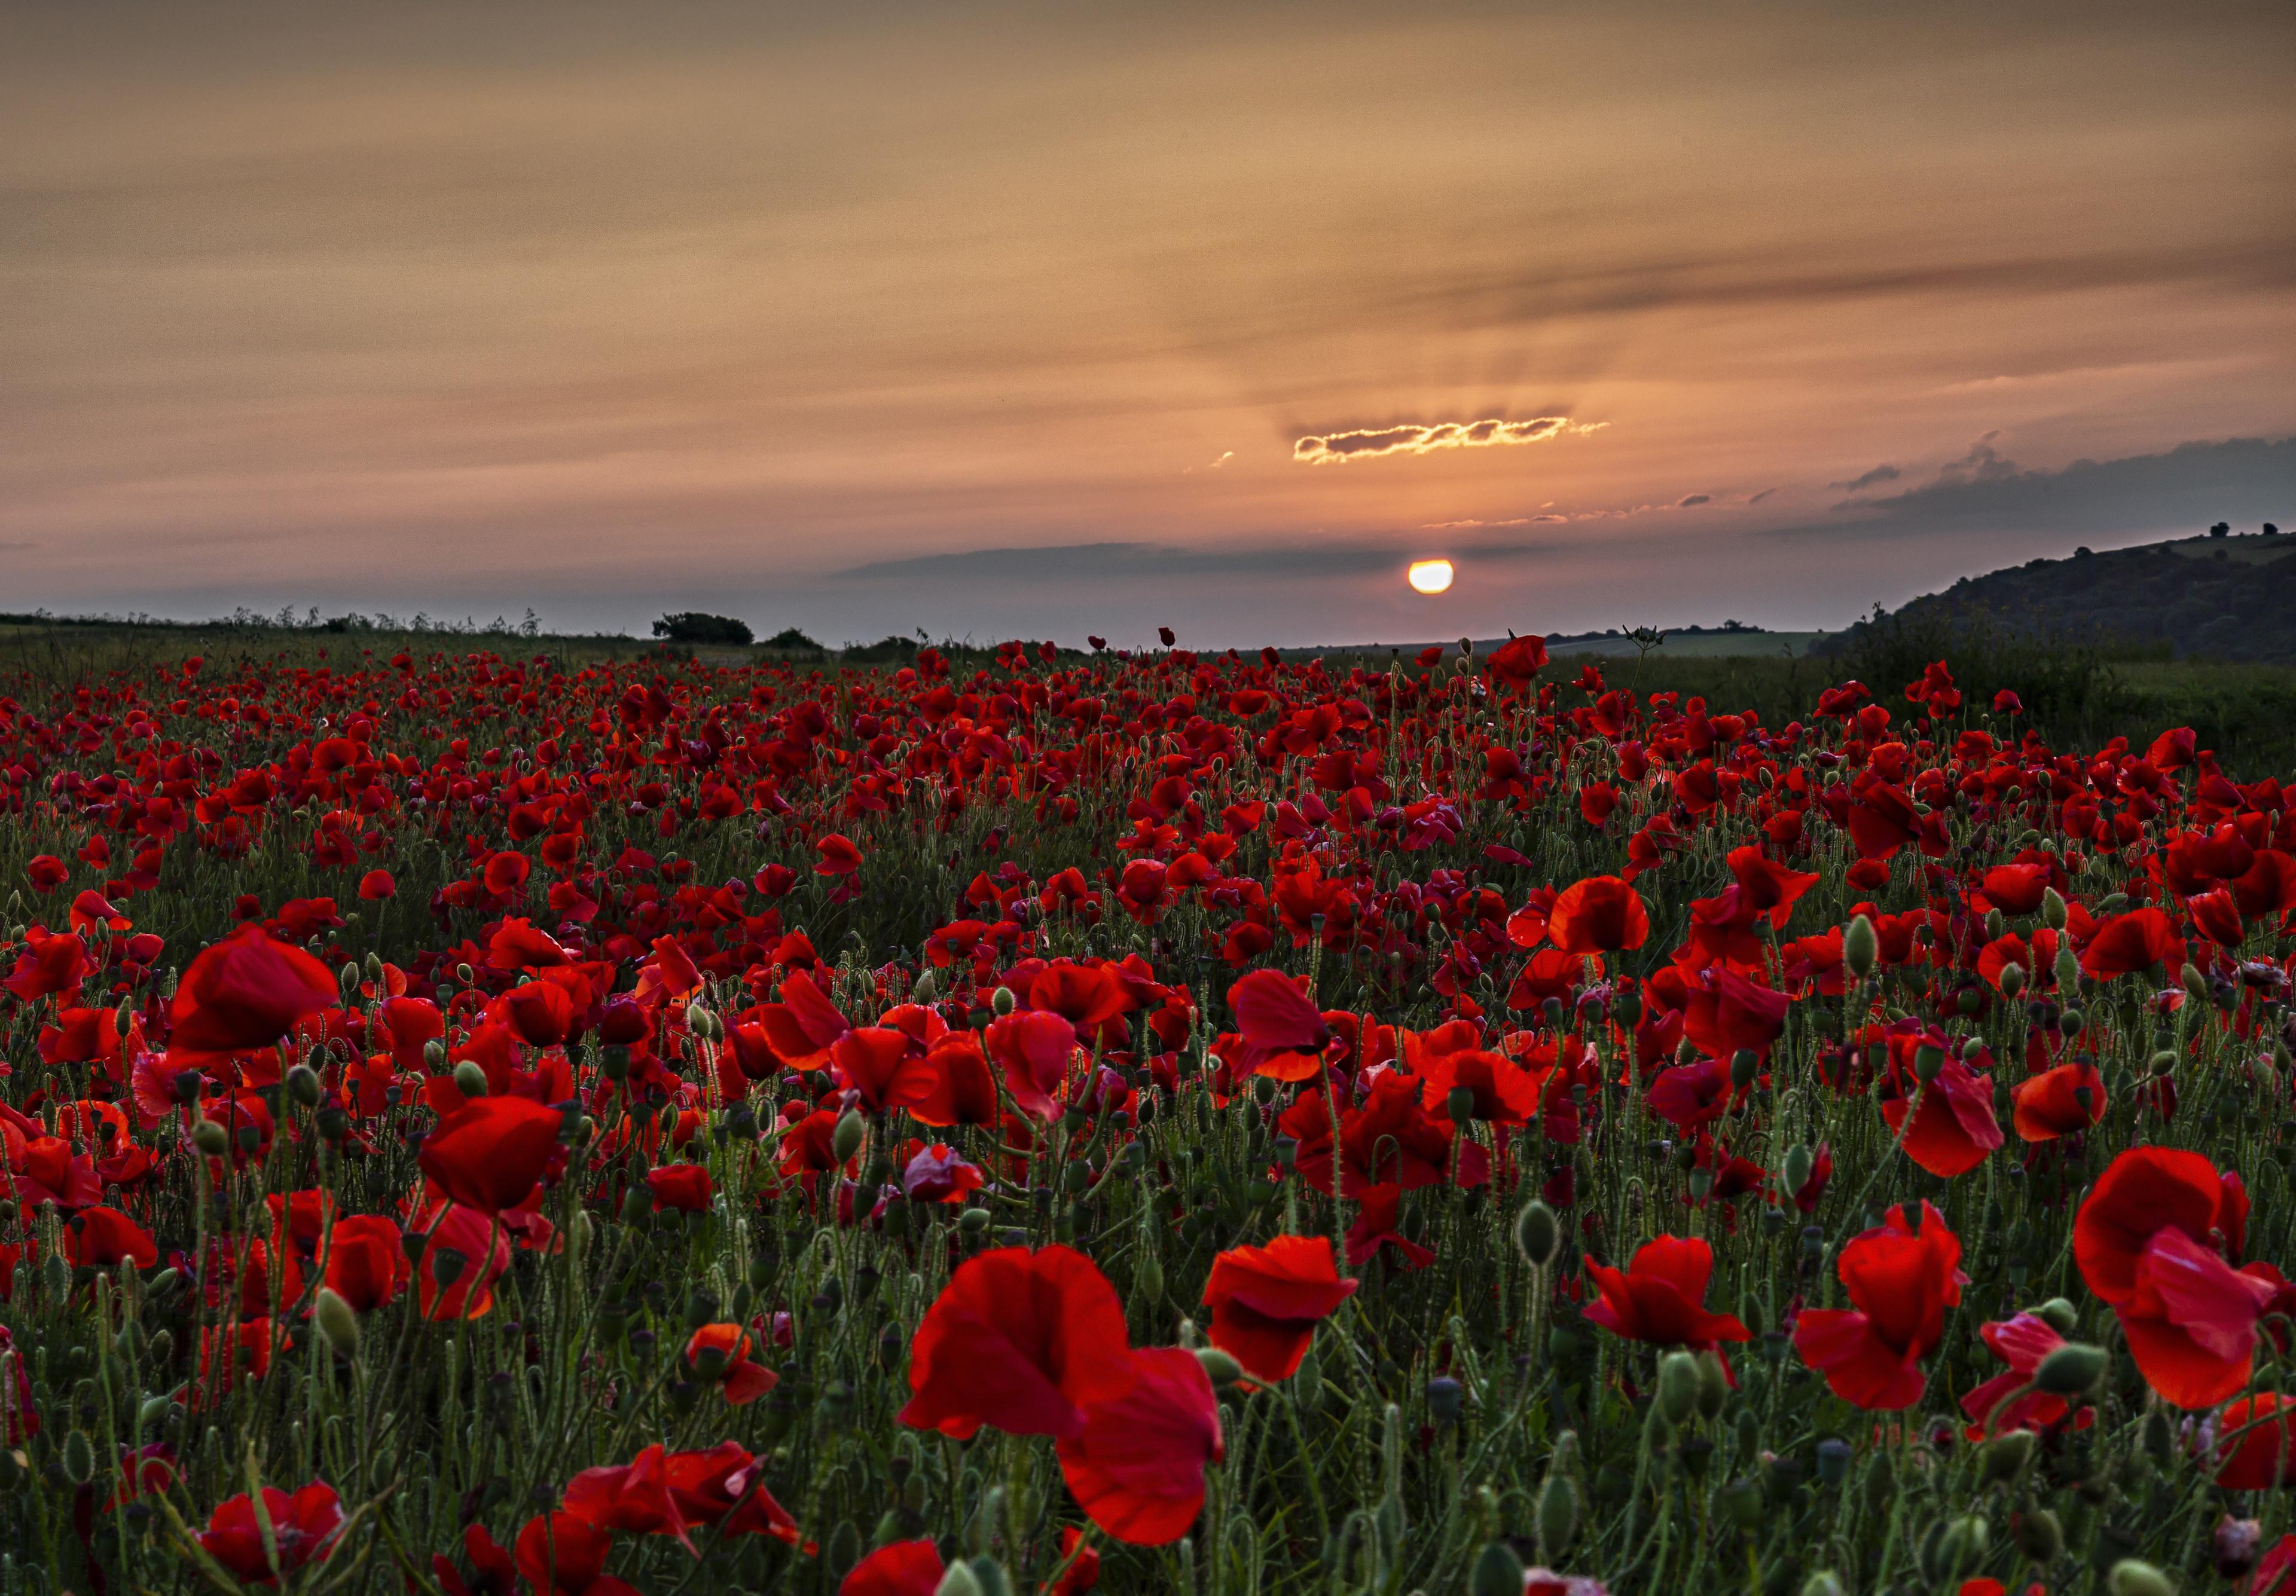 Sunset Nature Red Flower Summer 3840x2670